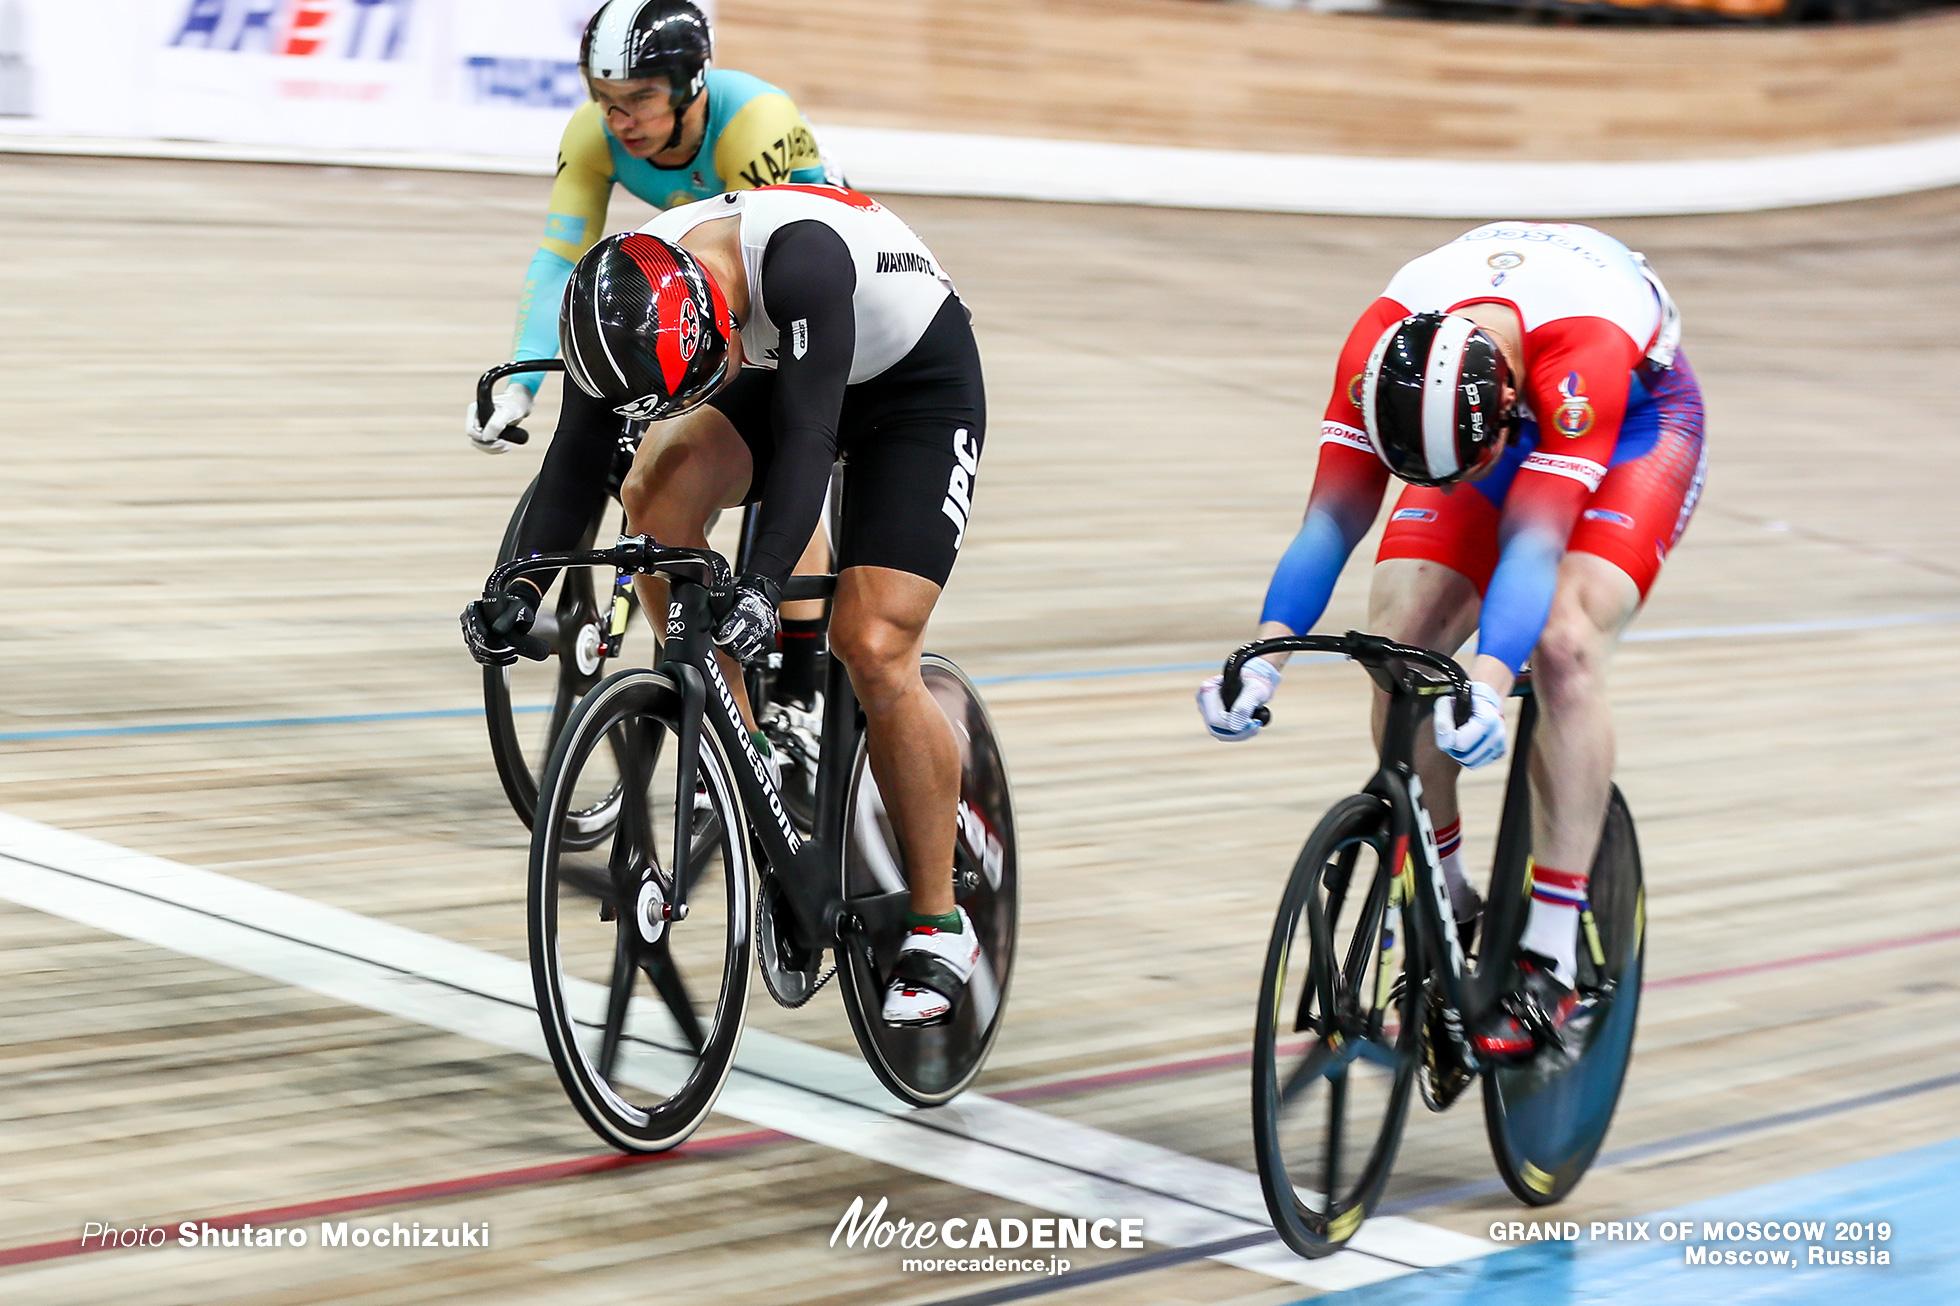 1/24 Finals / Men's Sprint / GRAND PRIX OF MOSCOW 2019